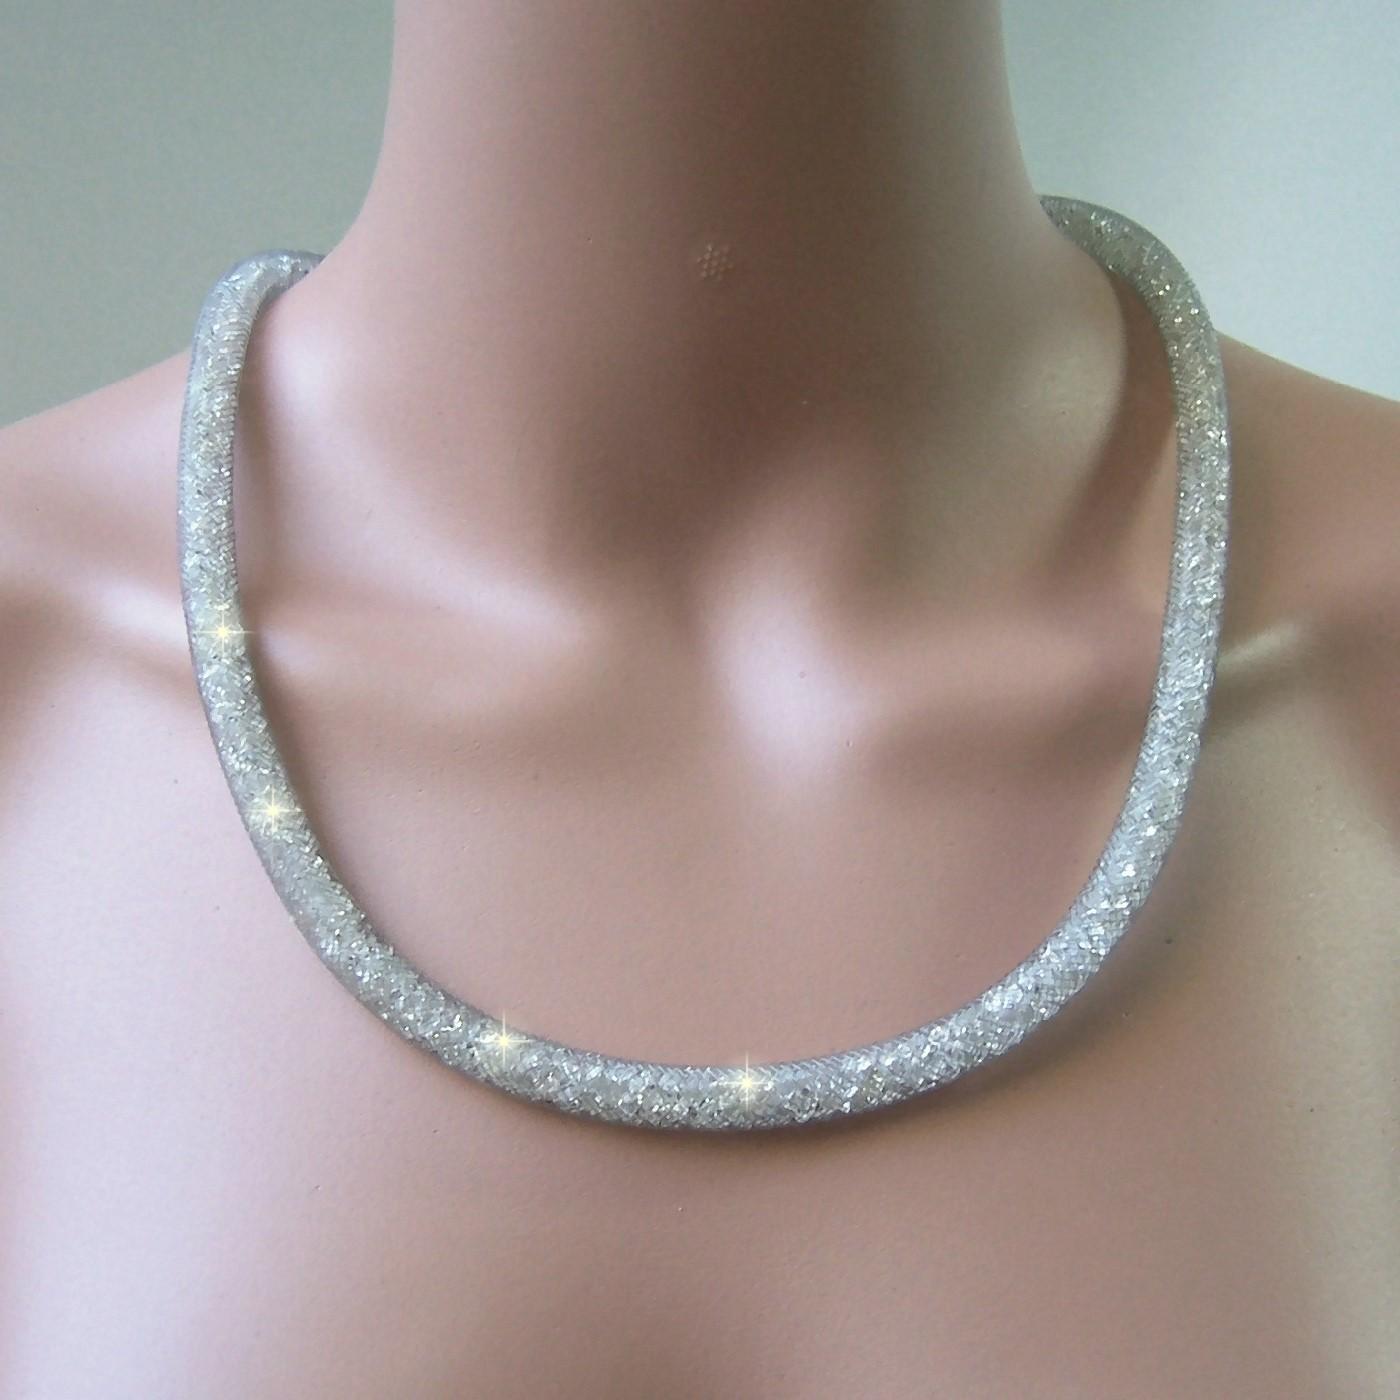 K2244# Collier 58cm lang Strasskristalle silbergrau in 3D-Netzschlauch